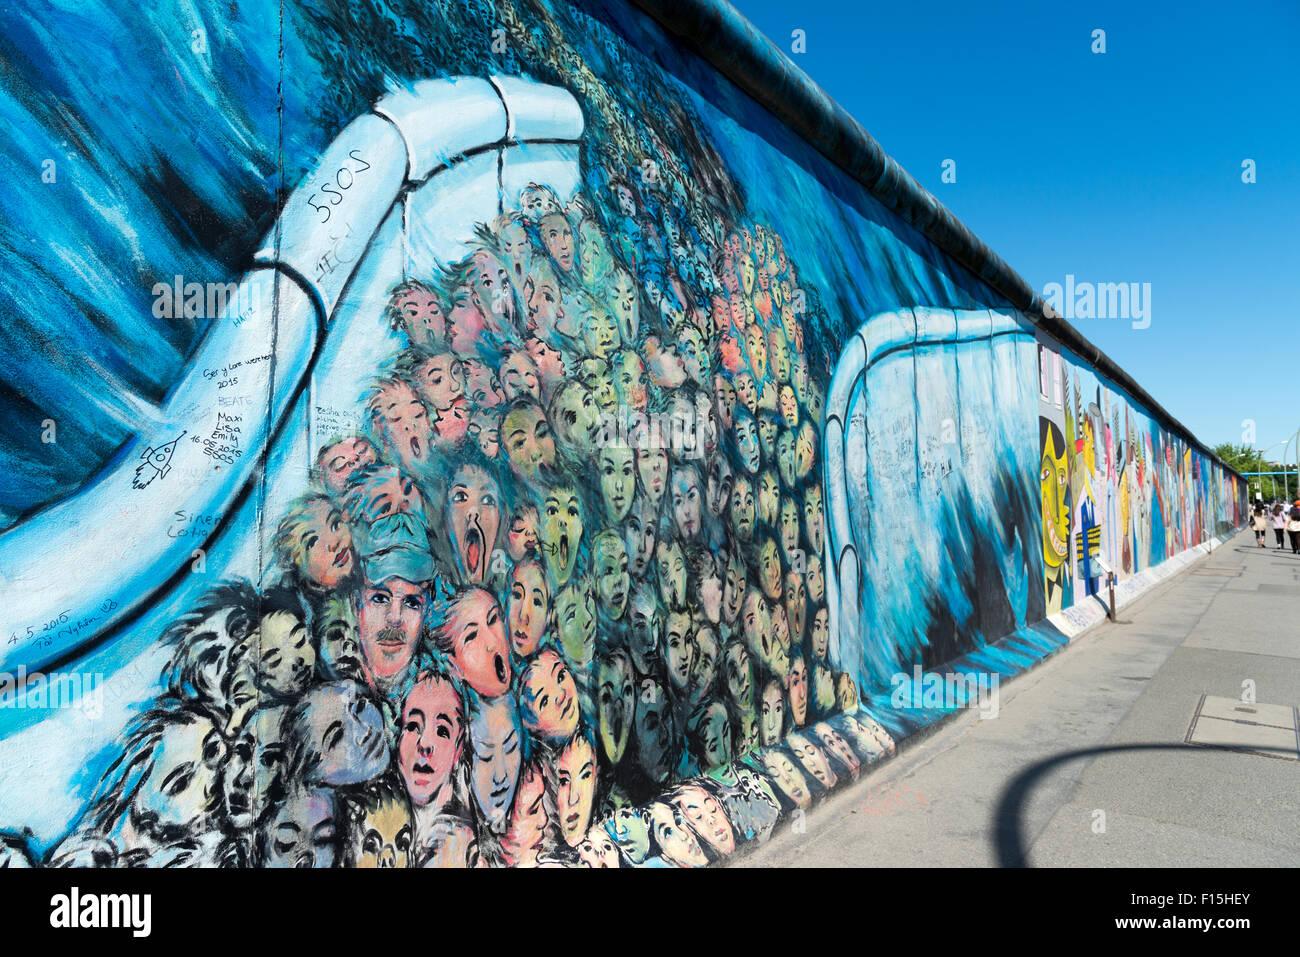 Die Berliner Mauer East Side Gallery, Berlin, Deutschland Stockbild